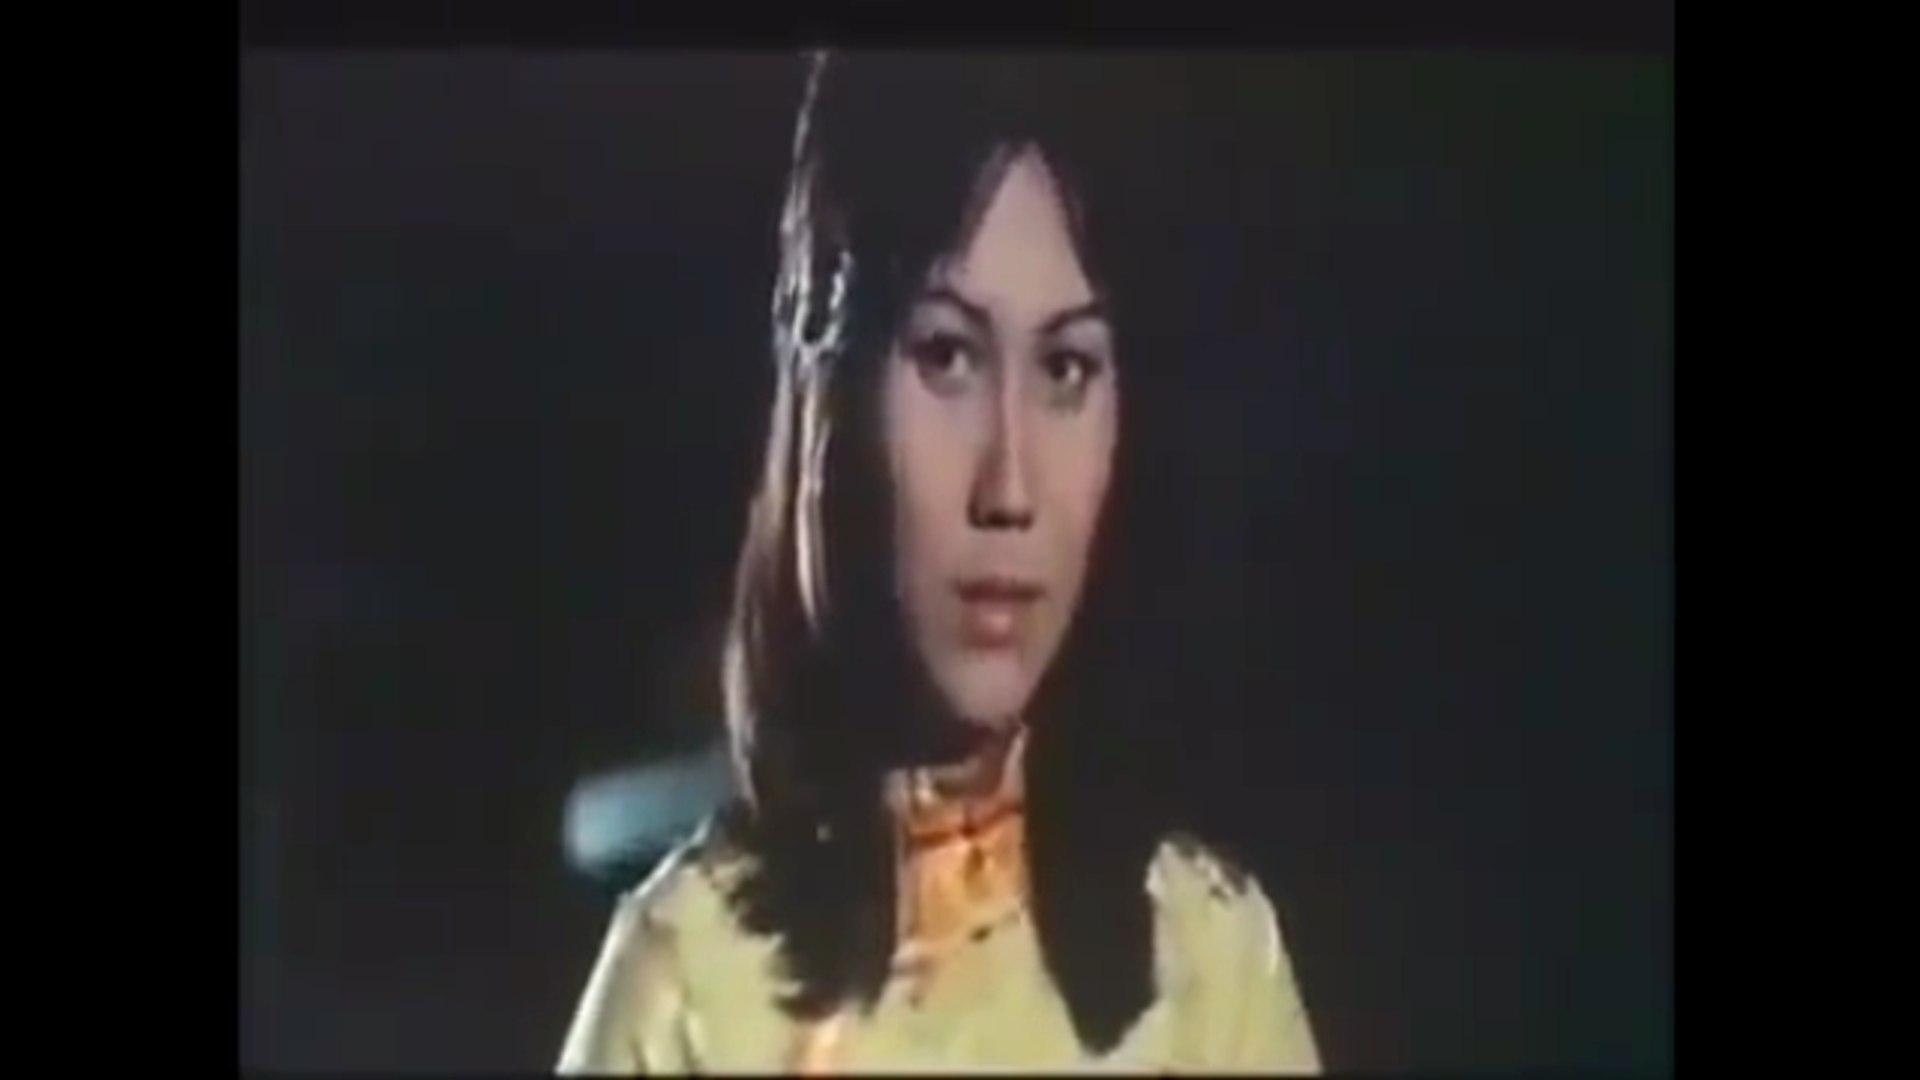 The Black Dragon (1974) - Ron Van Clief - Feature (Action, Drama)